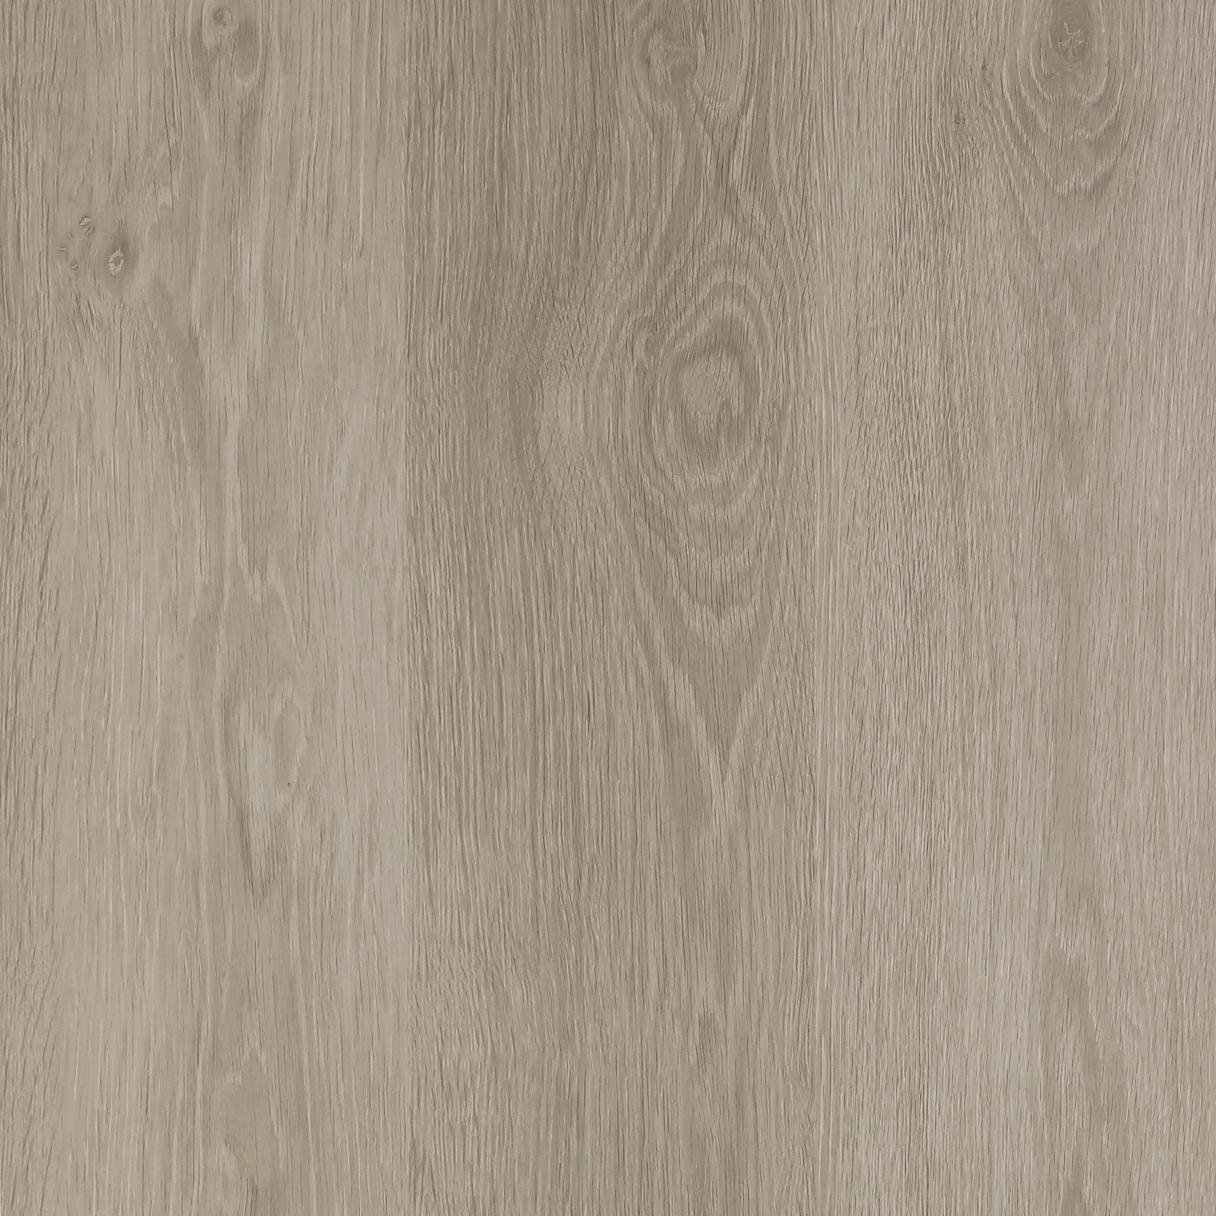 spc oak soundproof parquet waterproof eco friendly pvc removable vinyl flooring